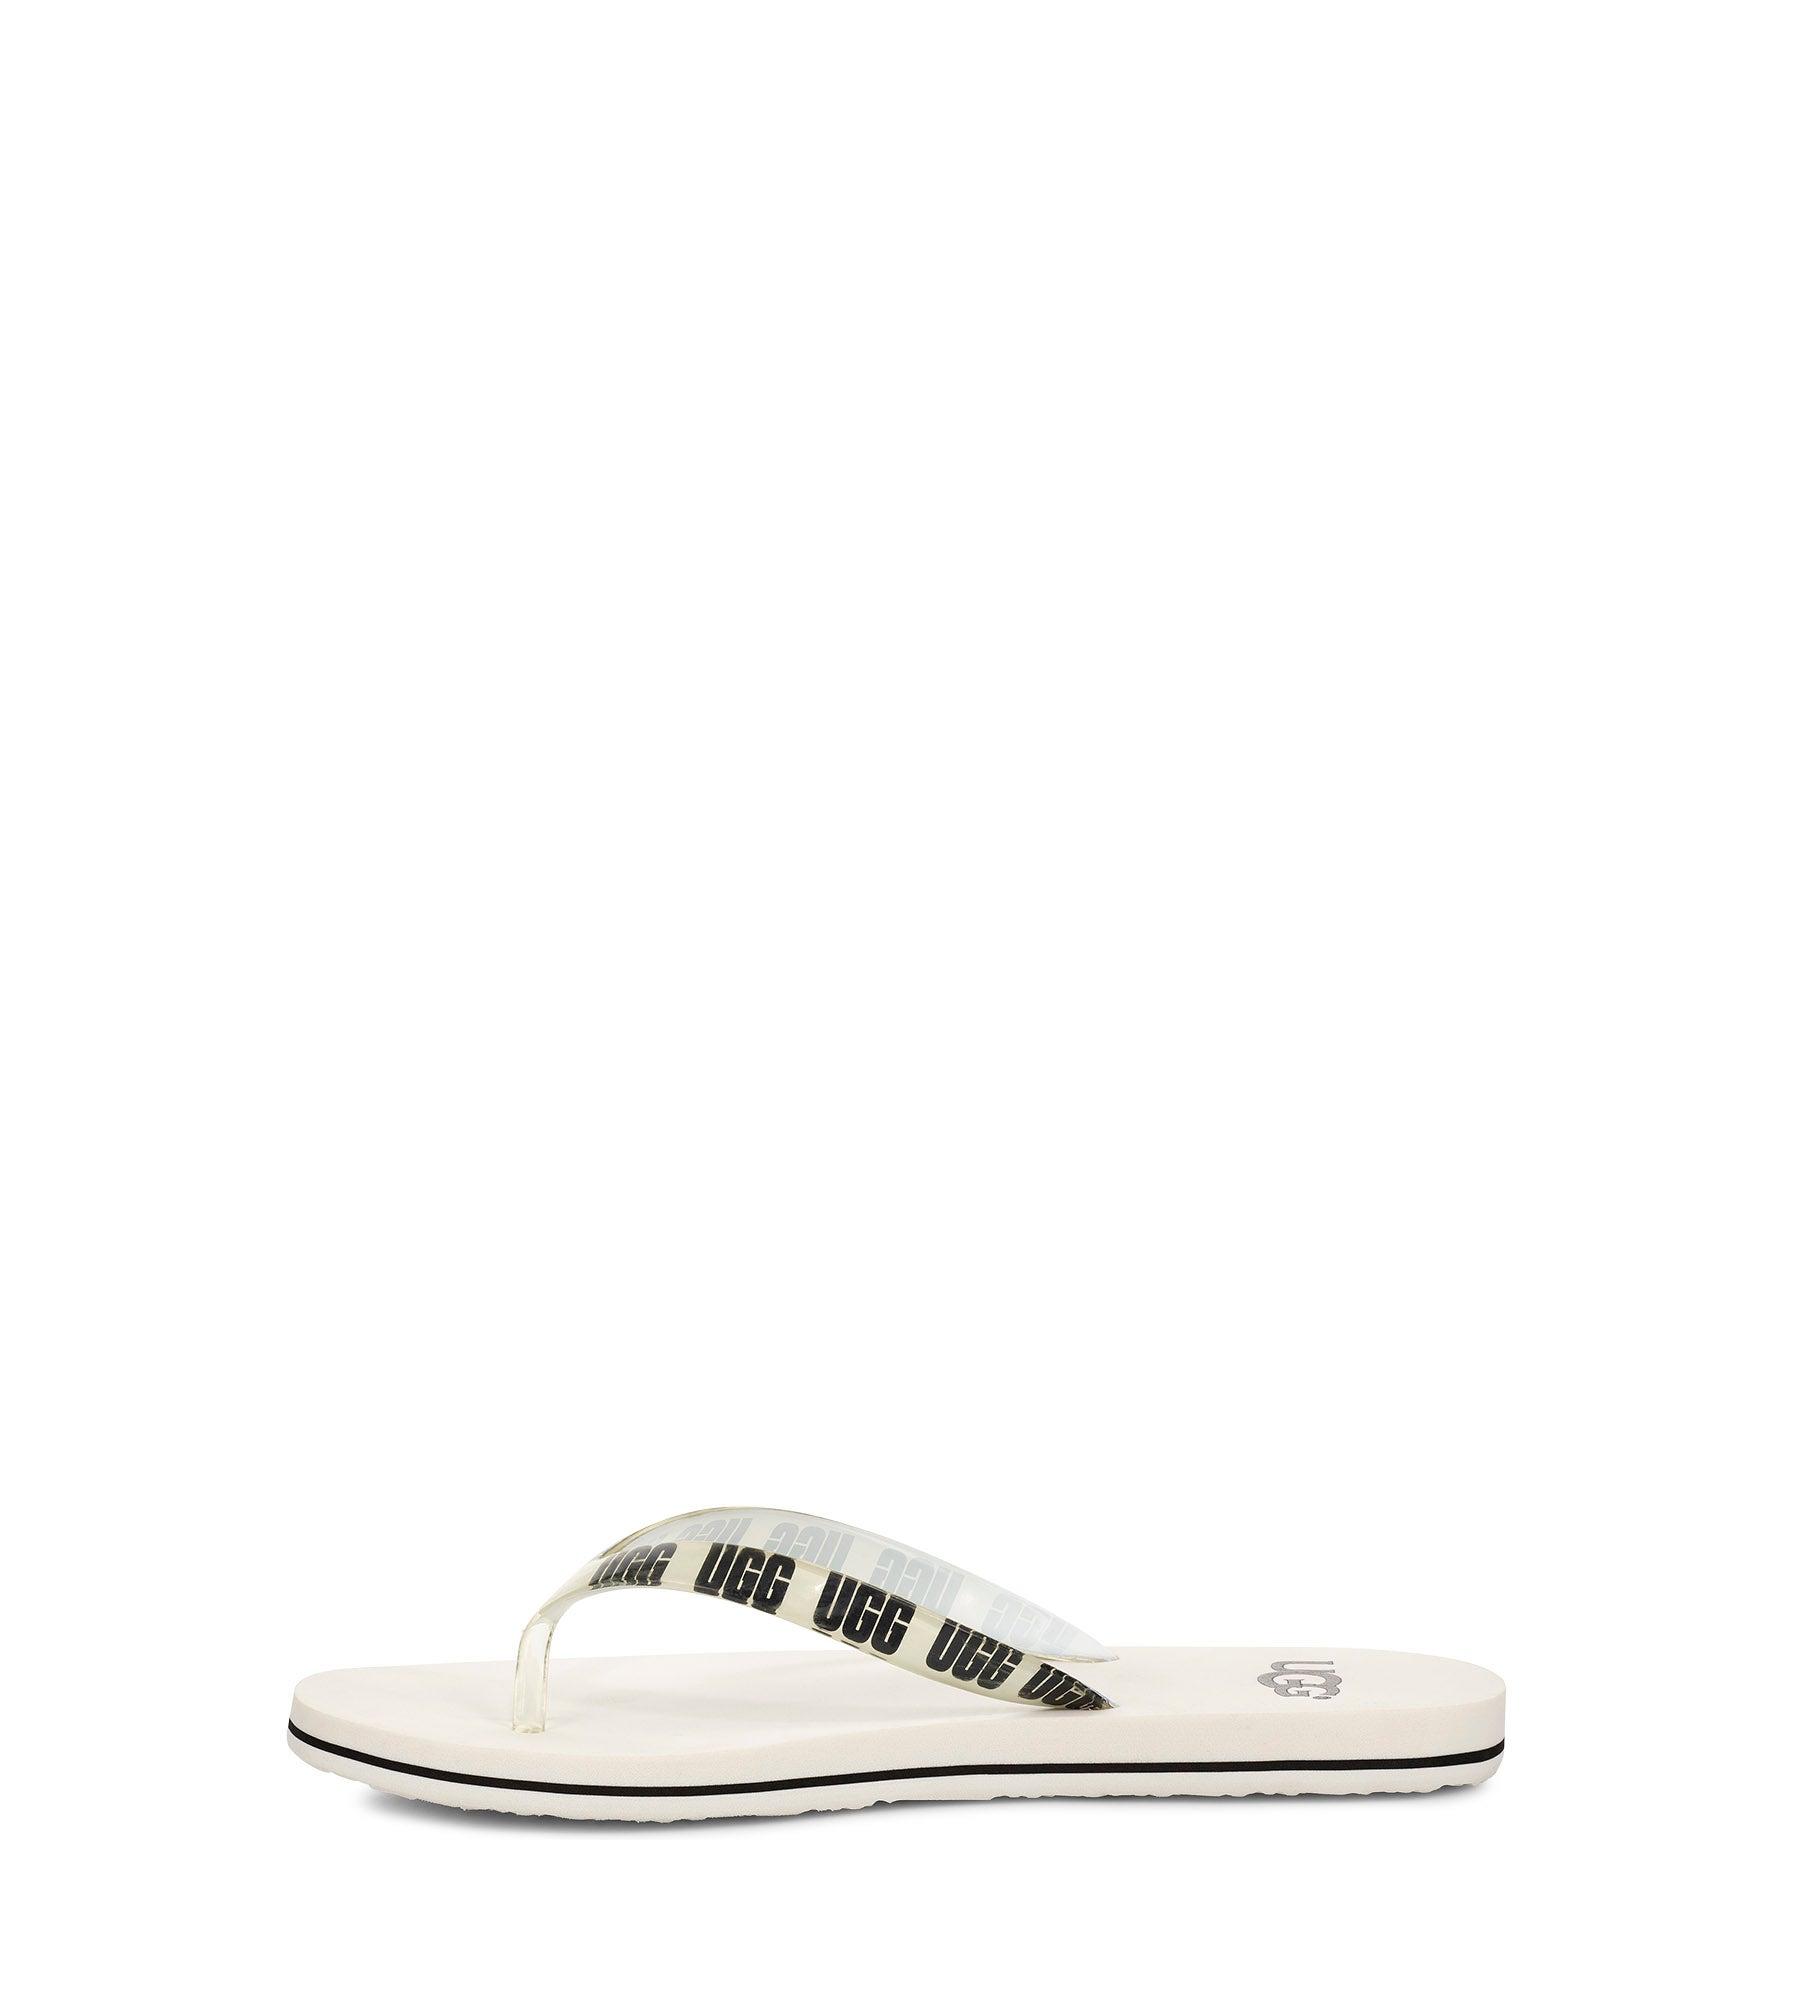 Lds Simi Graphic white thong sandal